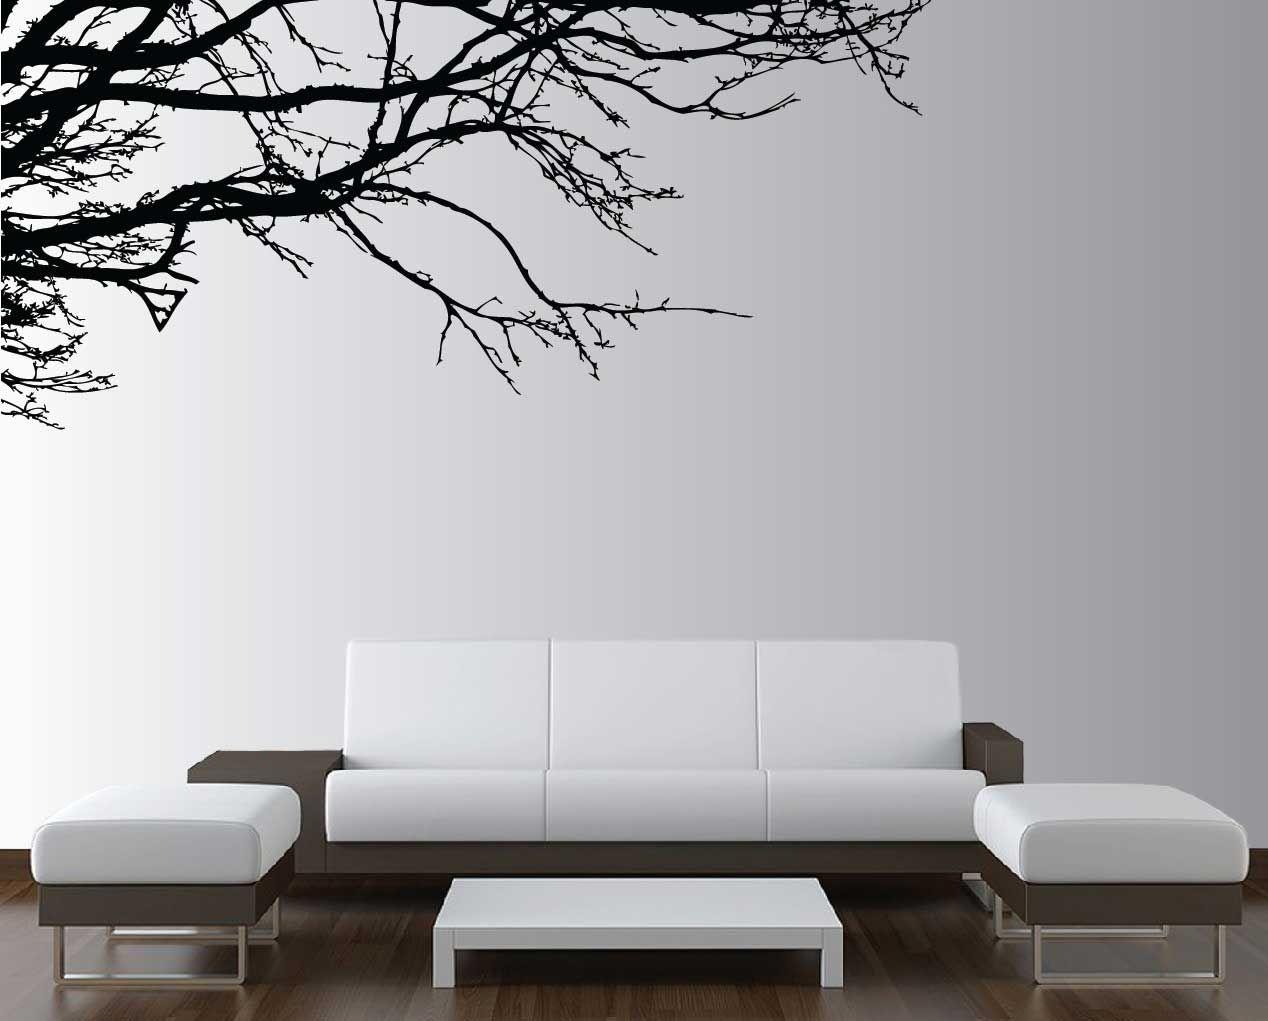 Wall Design Stencils pretty tree wall stencils design home furniture ideas | projects